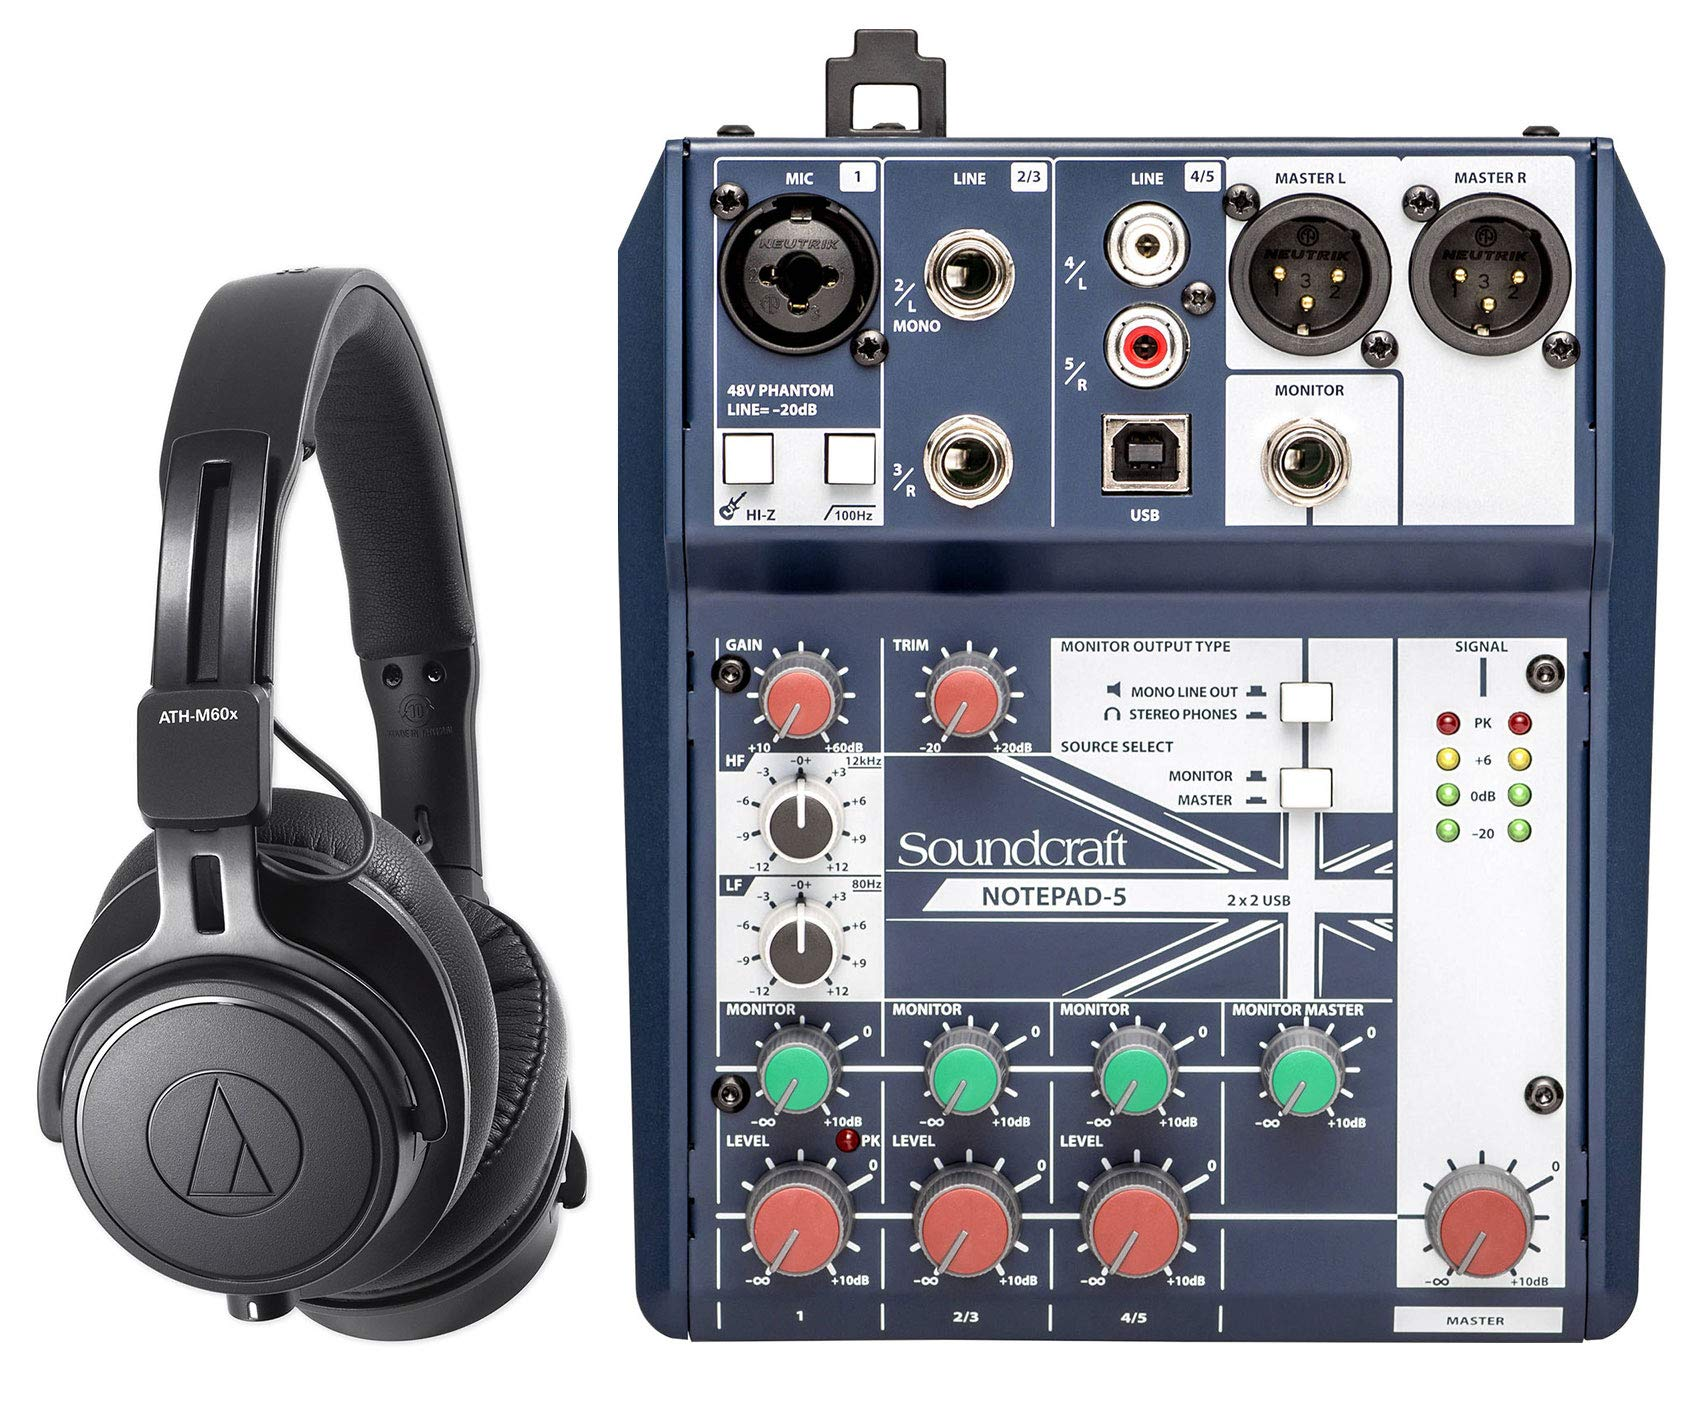 Audio Technica ATH-M60X Studio Headphones+Soundcraft Mixer w/USB Interface